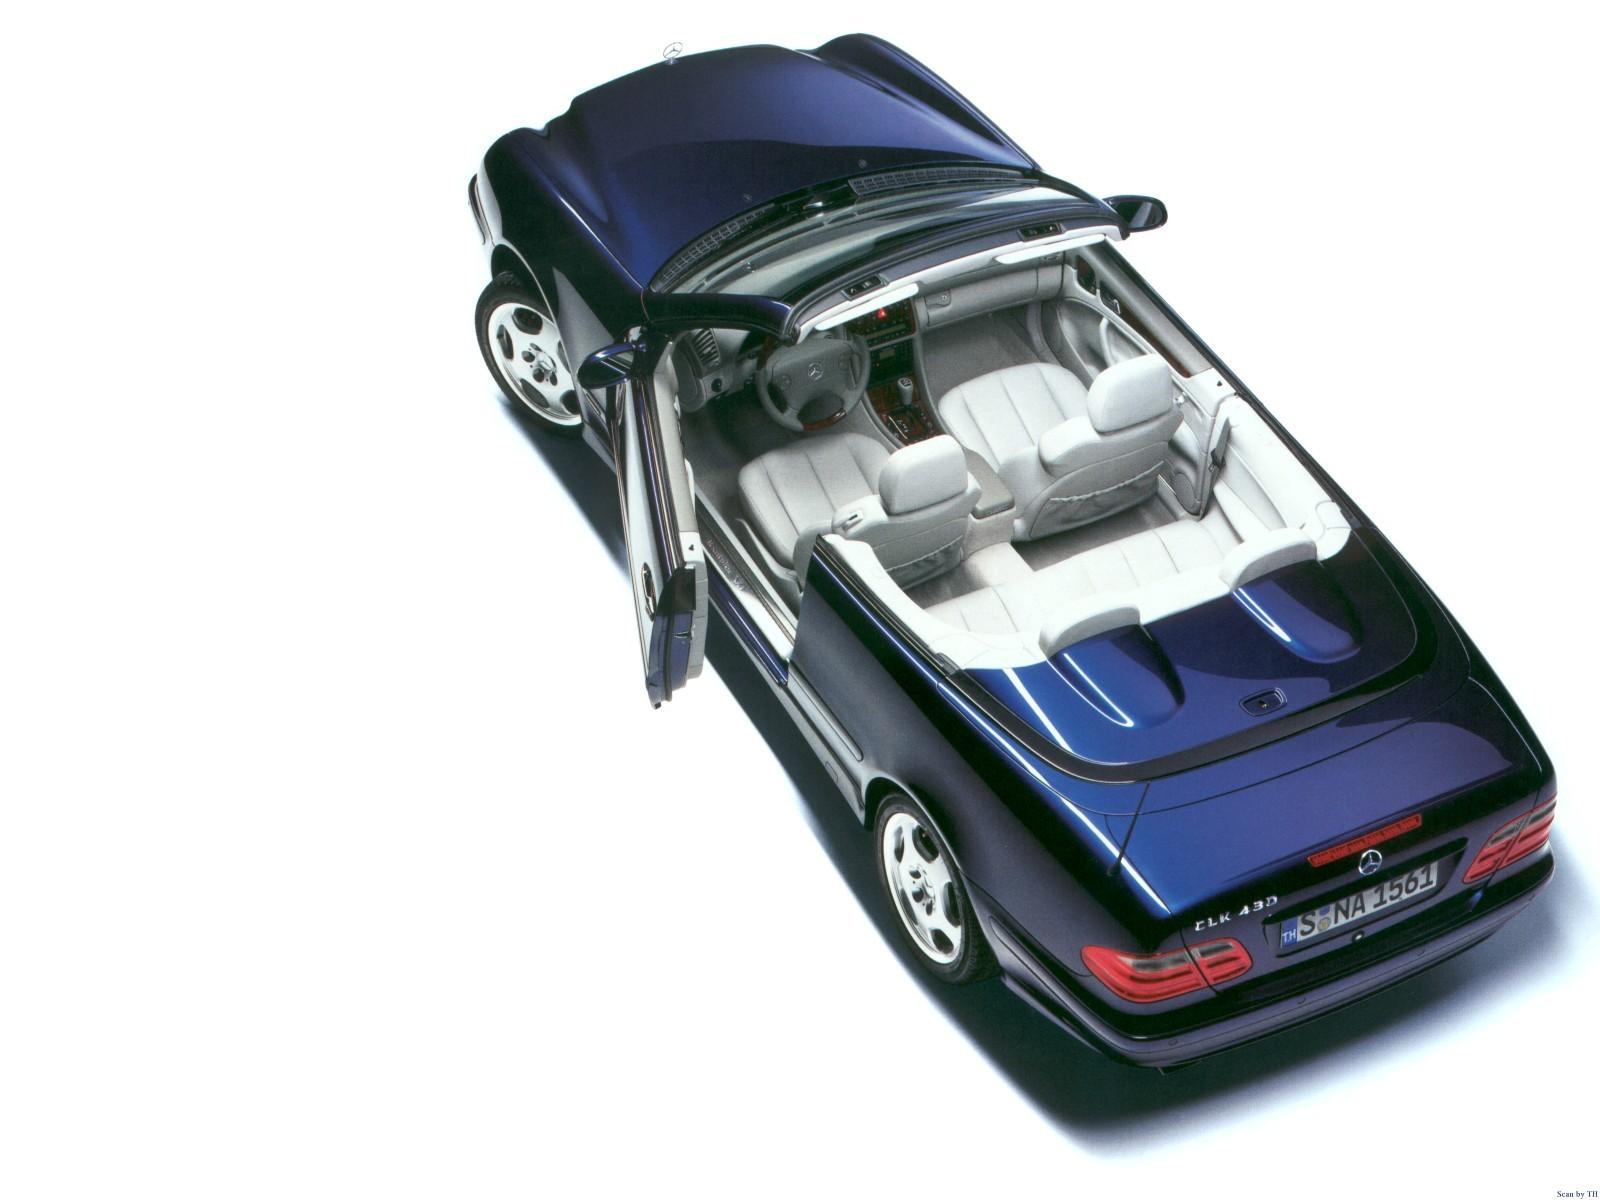 Mercedes clk430 1600x1200